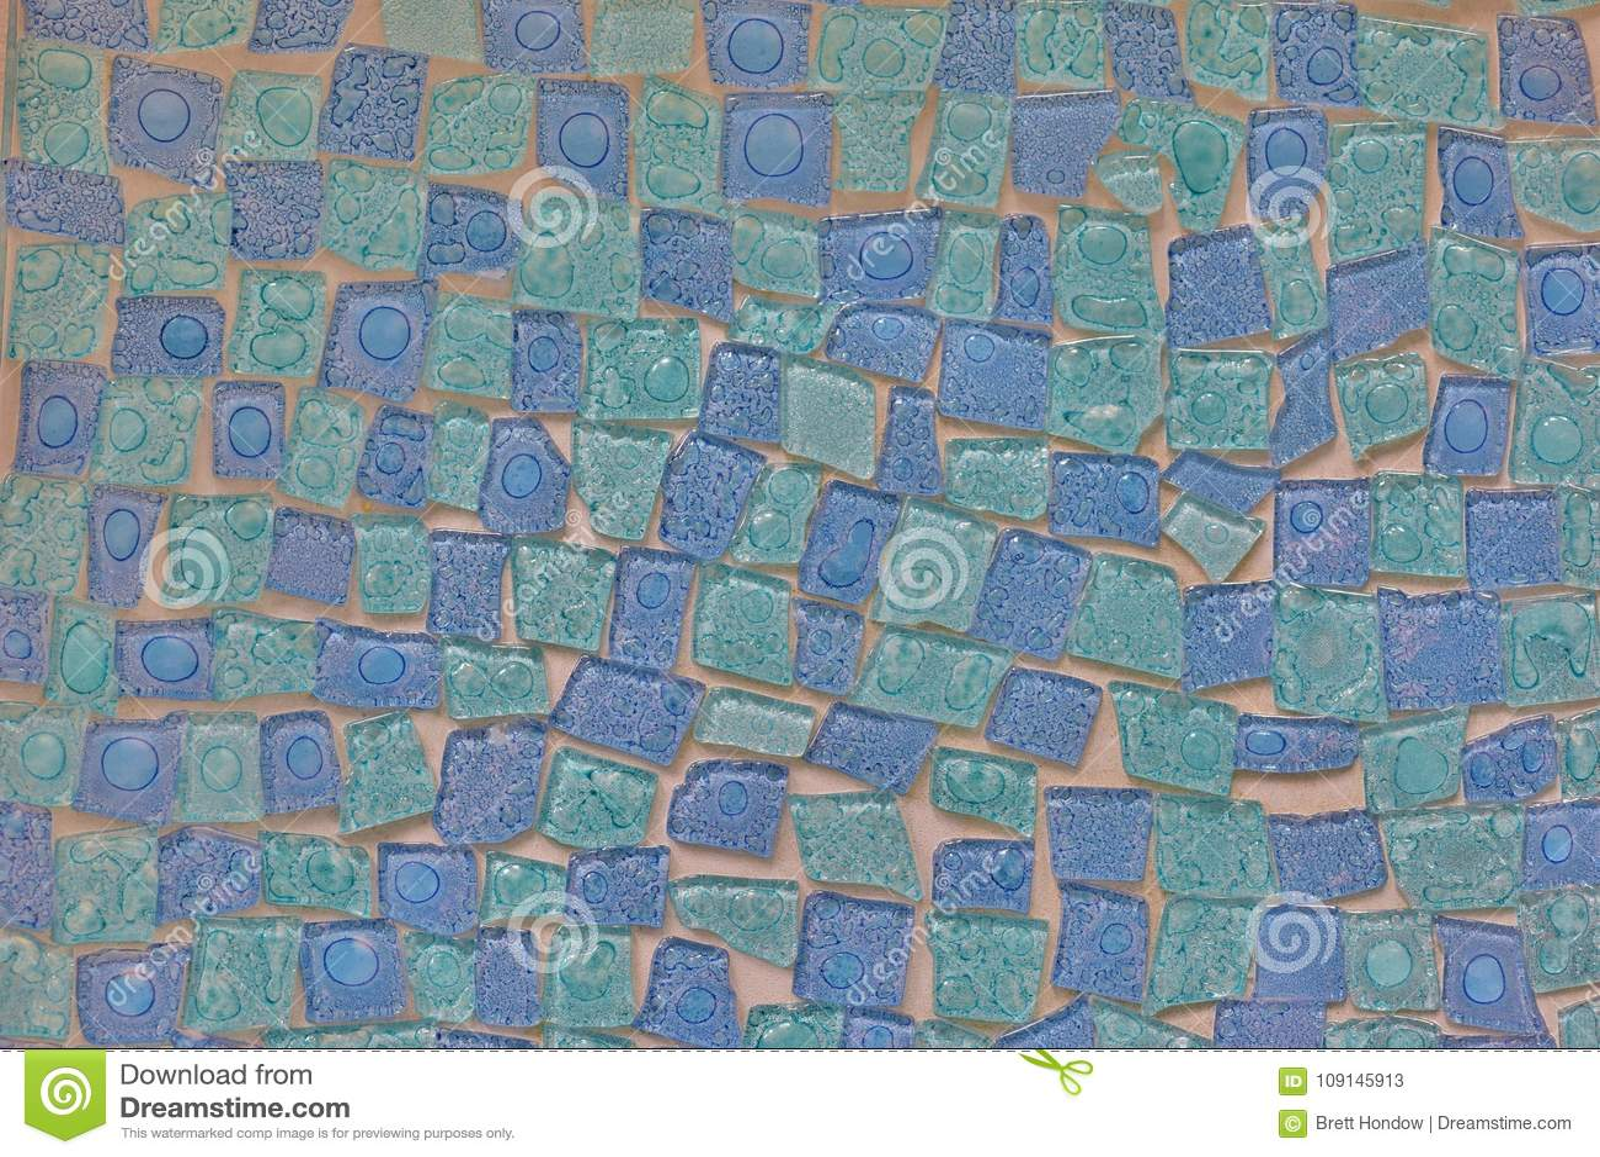 Interesting Blue Mosaic Tile Pattern. Stock Image - Image of crafts ...